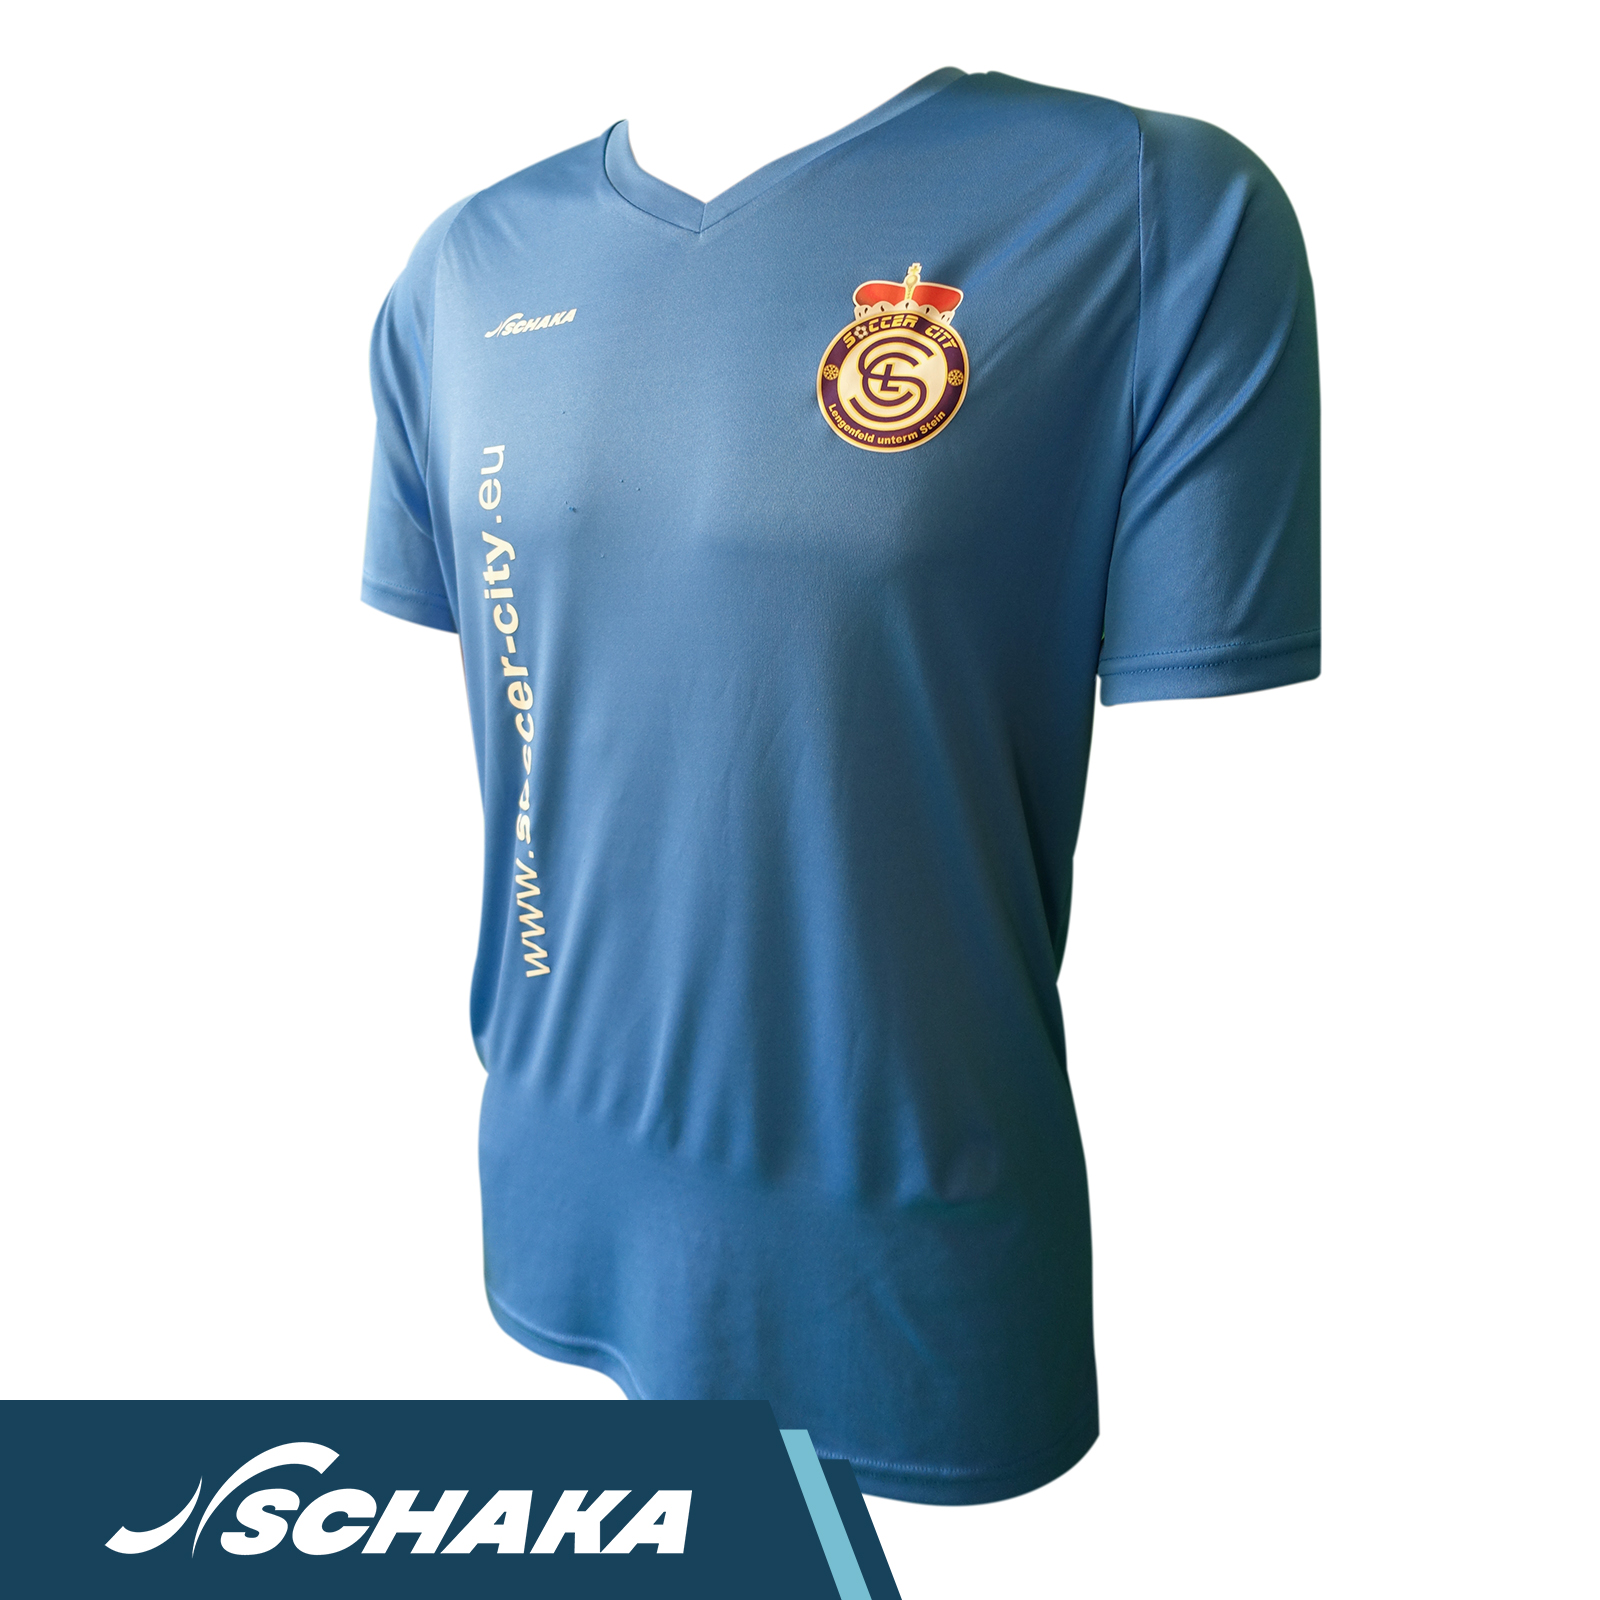 Schaka Jersey MUA Soccer City Edition